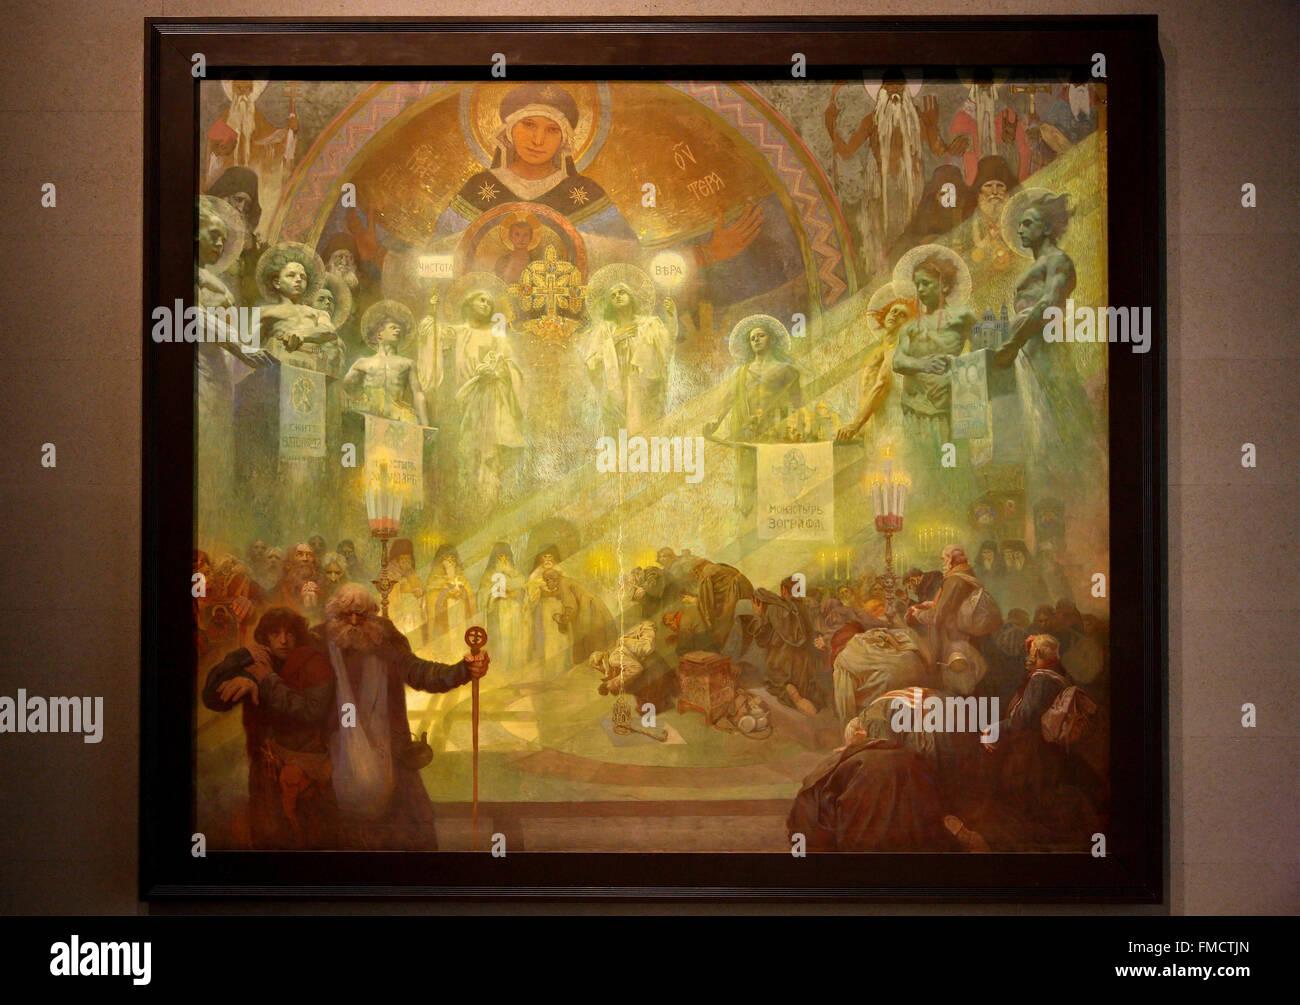 Part of the of the exhibition of the 'Slav Epic' ('Slovanska Epopej'), of Alphonse Mucha in Veletrzni - Stock Image